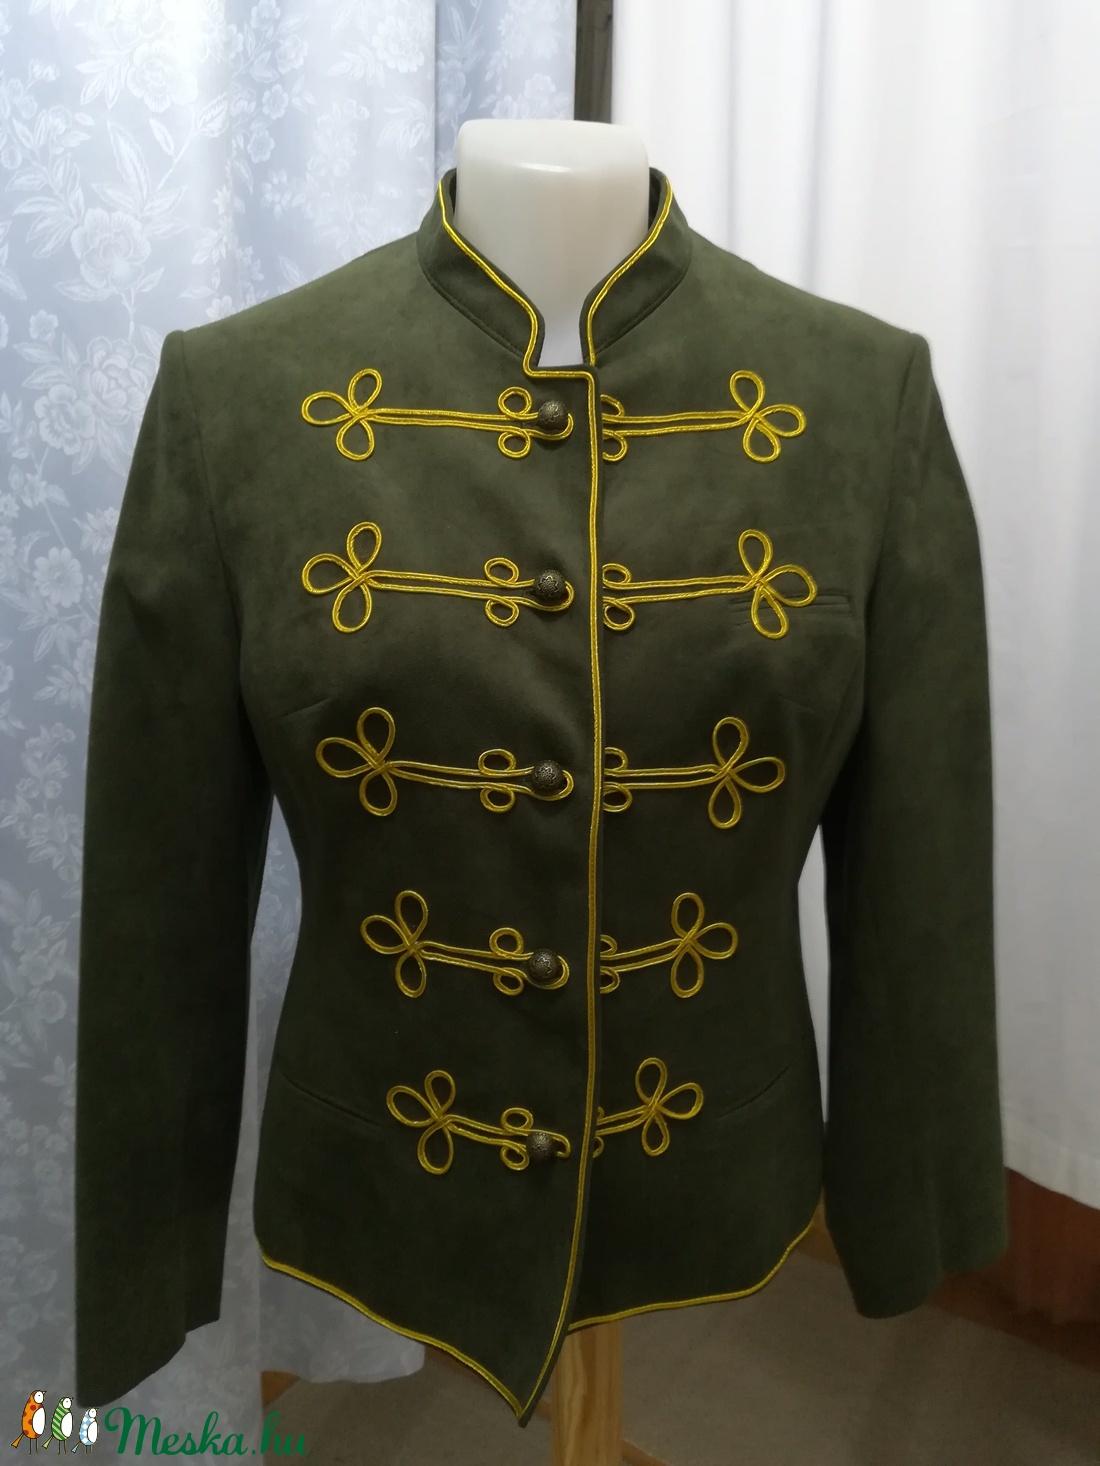 0974497557c Női Bocskai zsinóros kabát (SzucsKatalin01) - Meska.hu